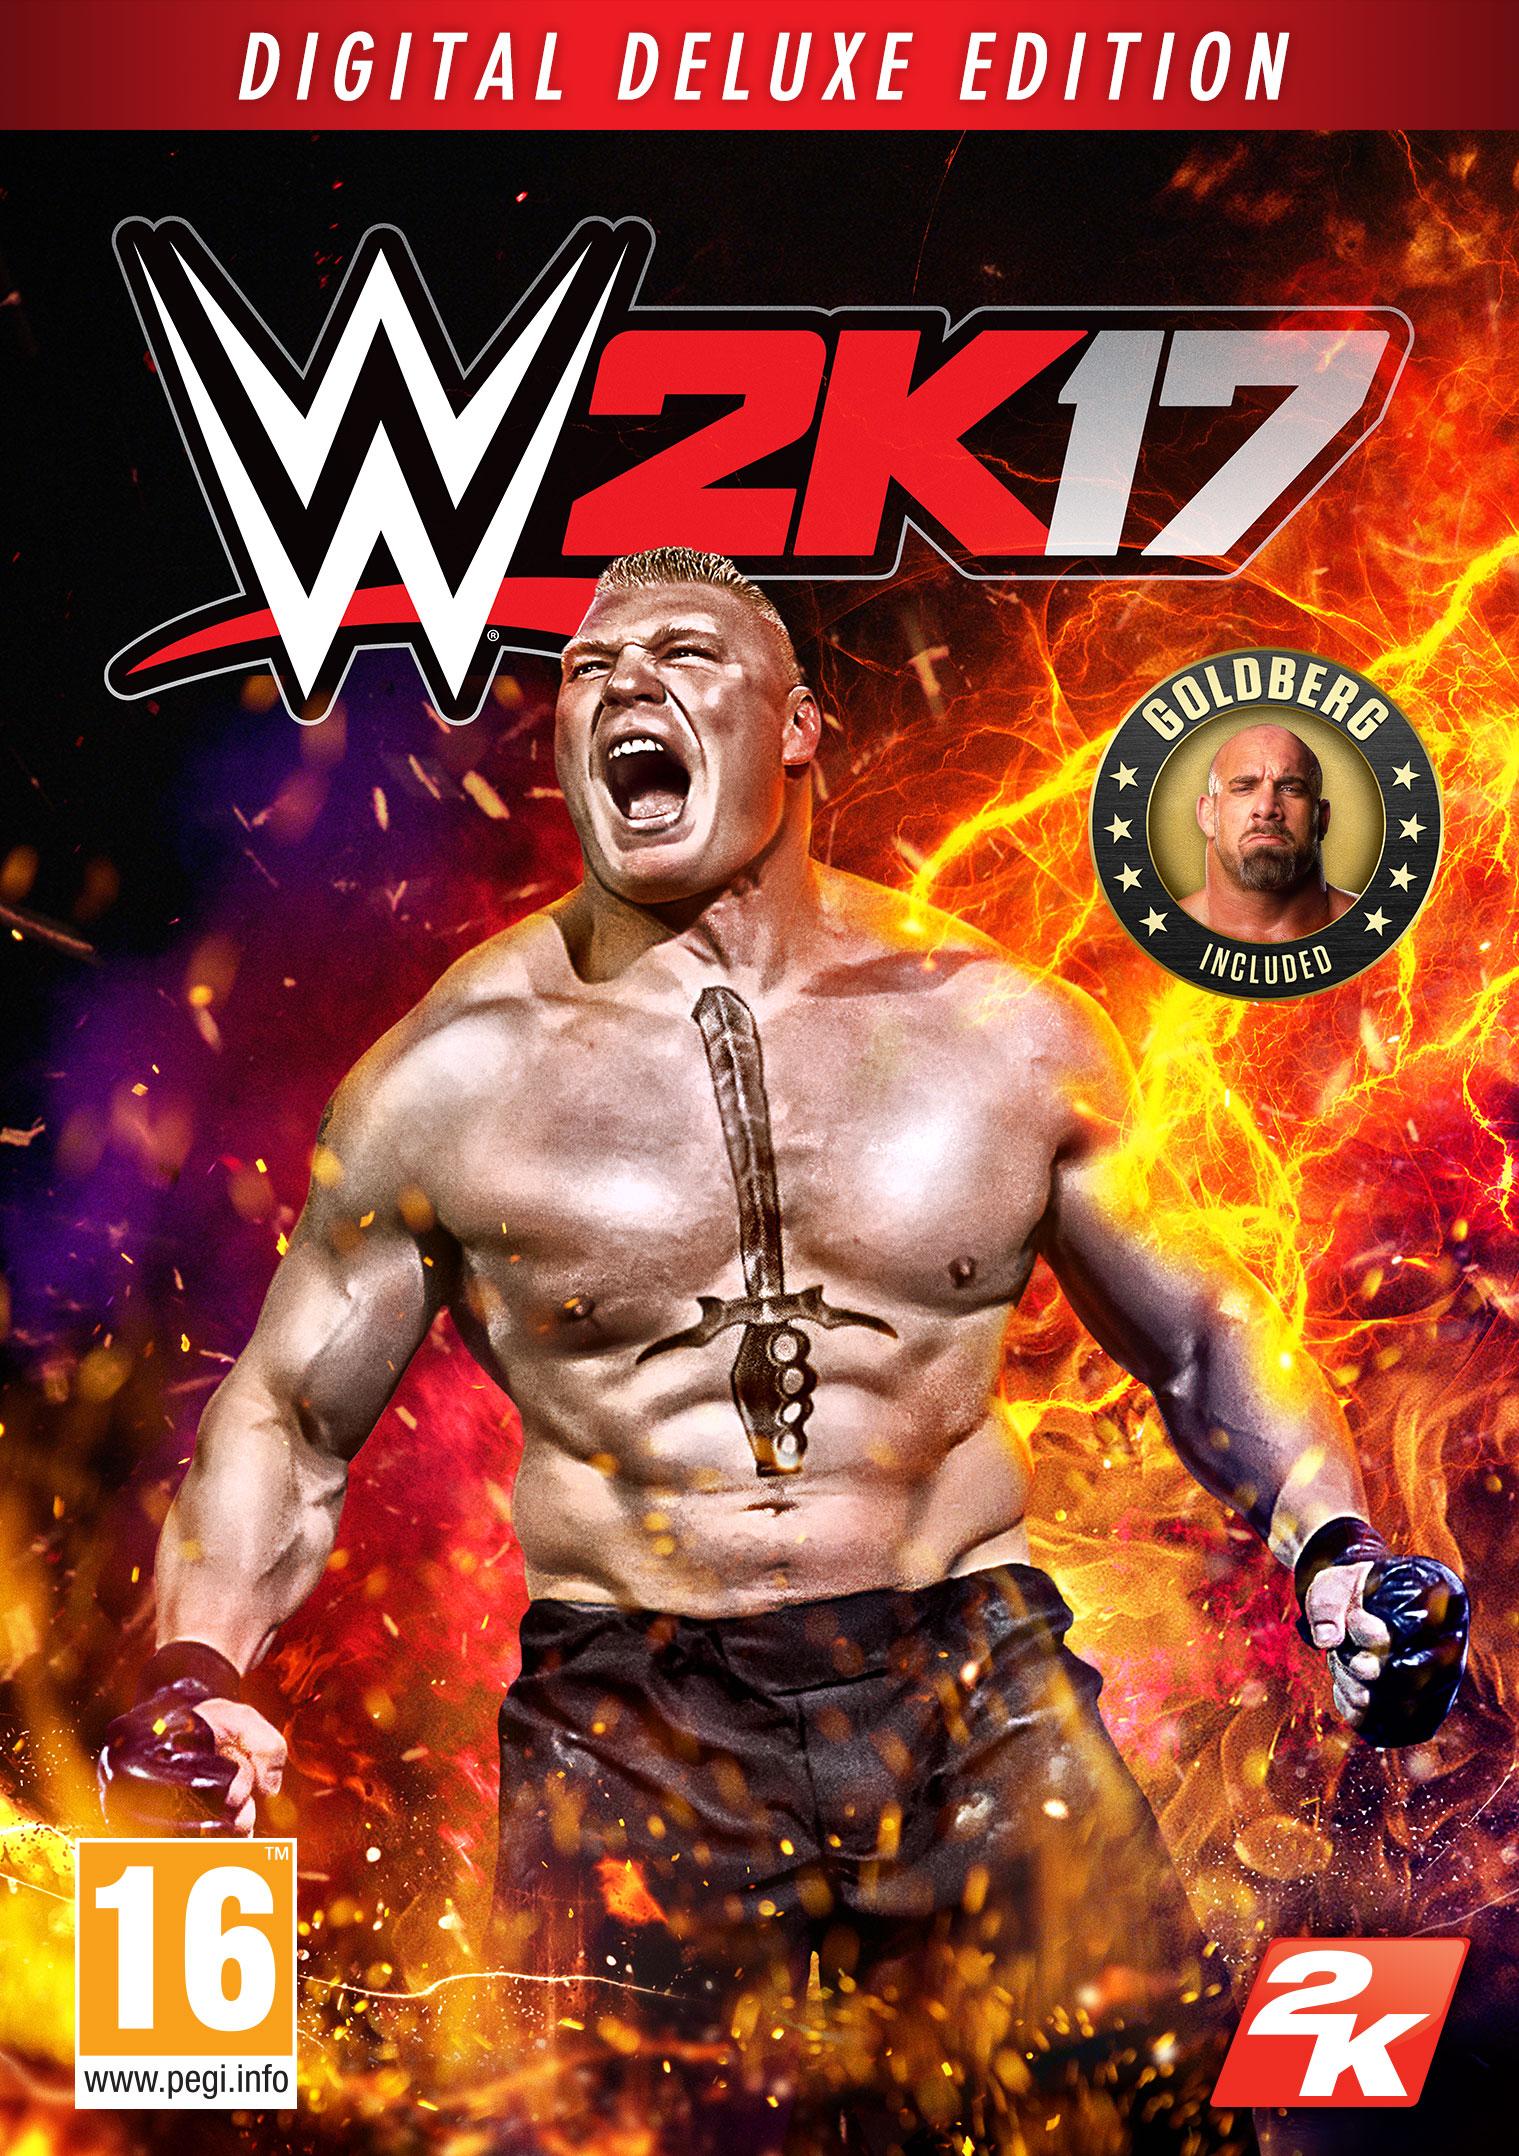 WWE 2K17 Digital Deluxe Edition (PC) DIGITAL